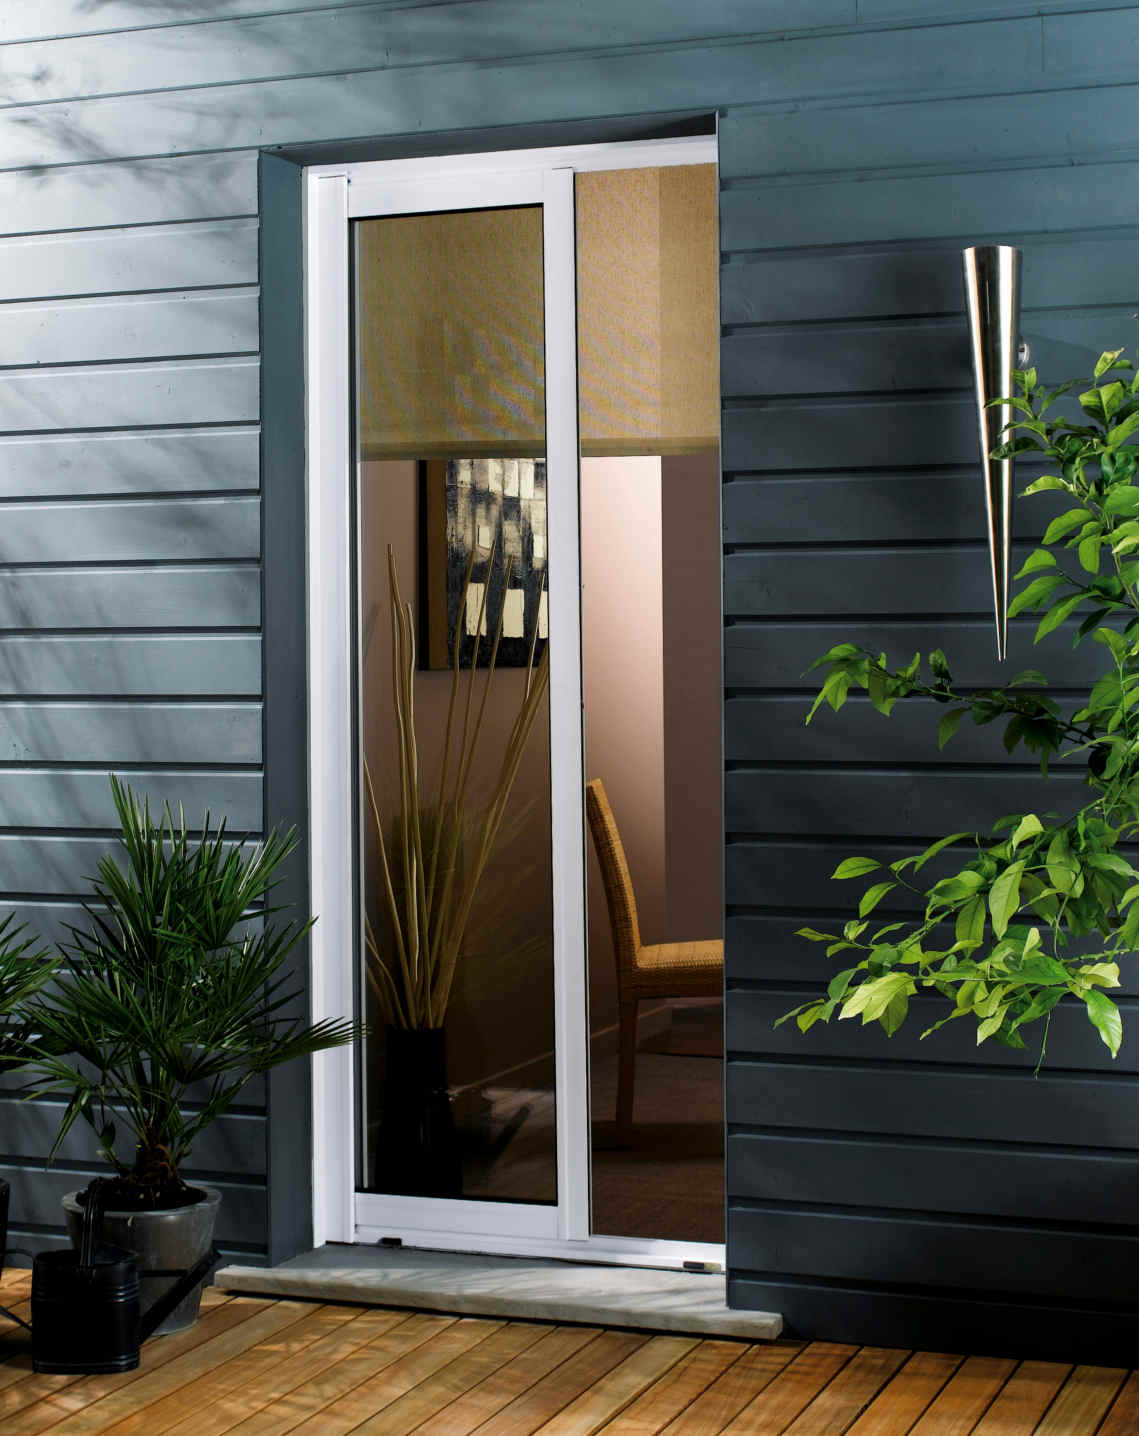 bien choisir sa fen tre ou porte fen tre leroy merlin. Black Bedroom Furniture Sets. Home Design Ideas